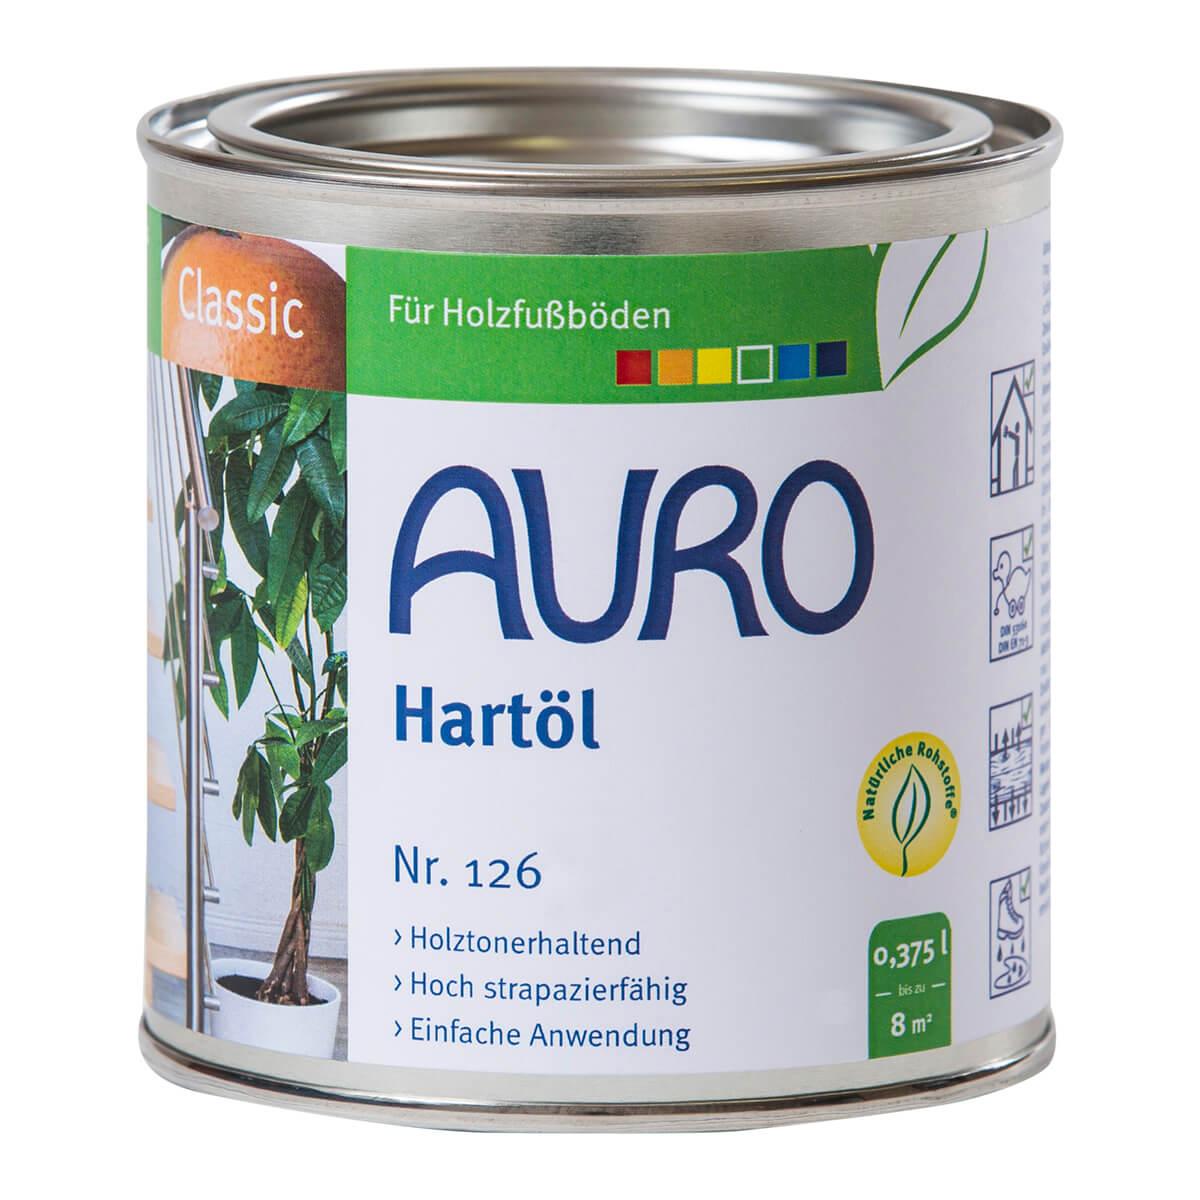 AURO Hartöl